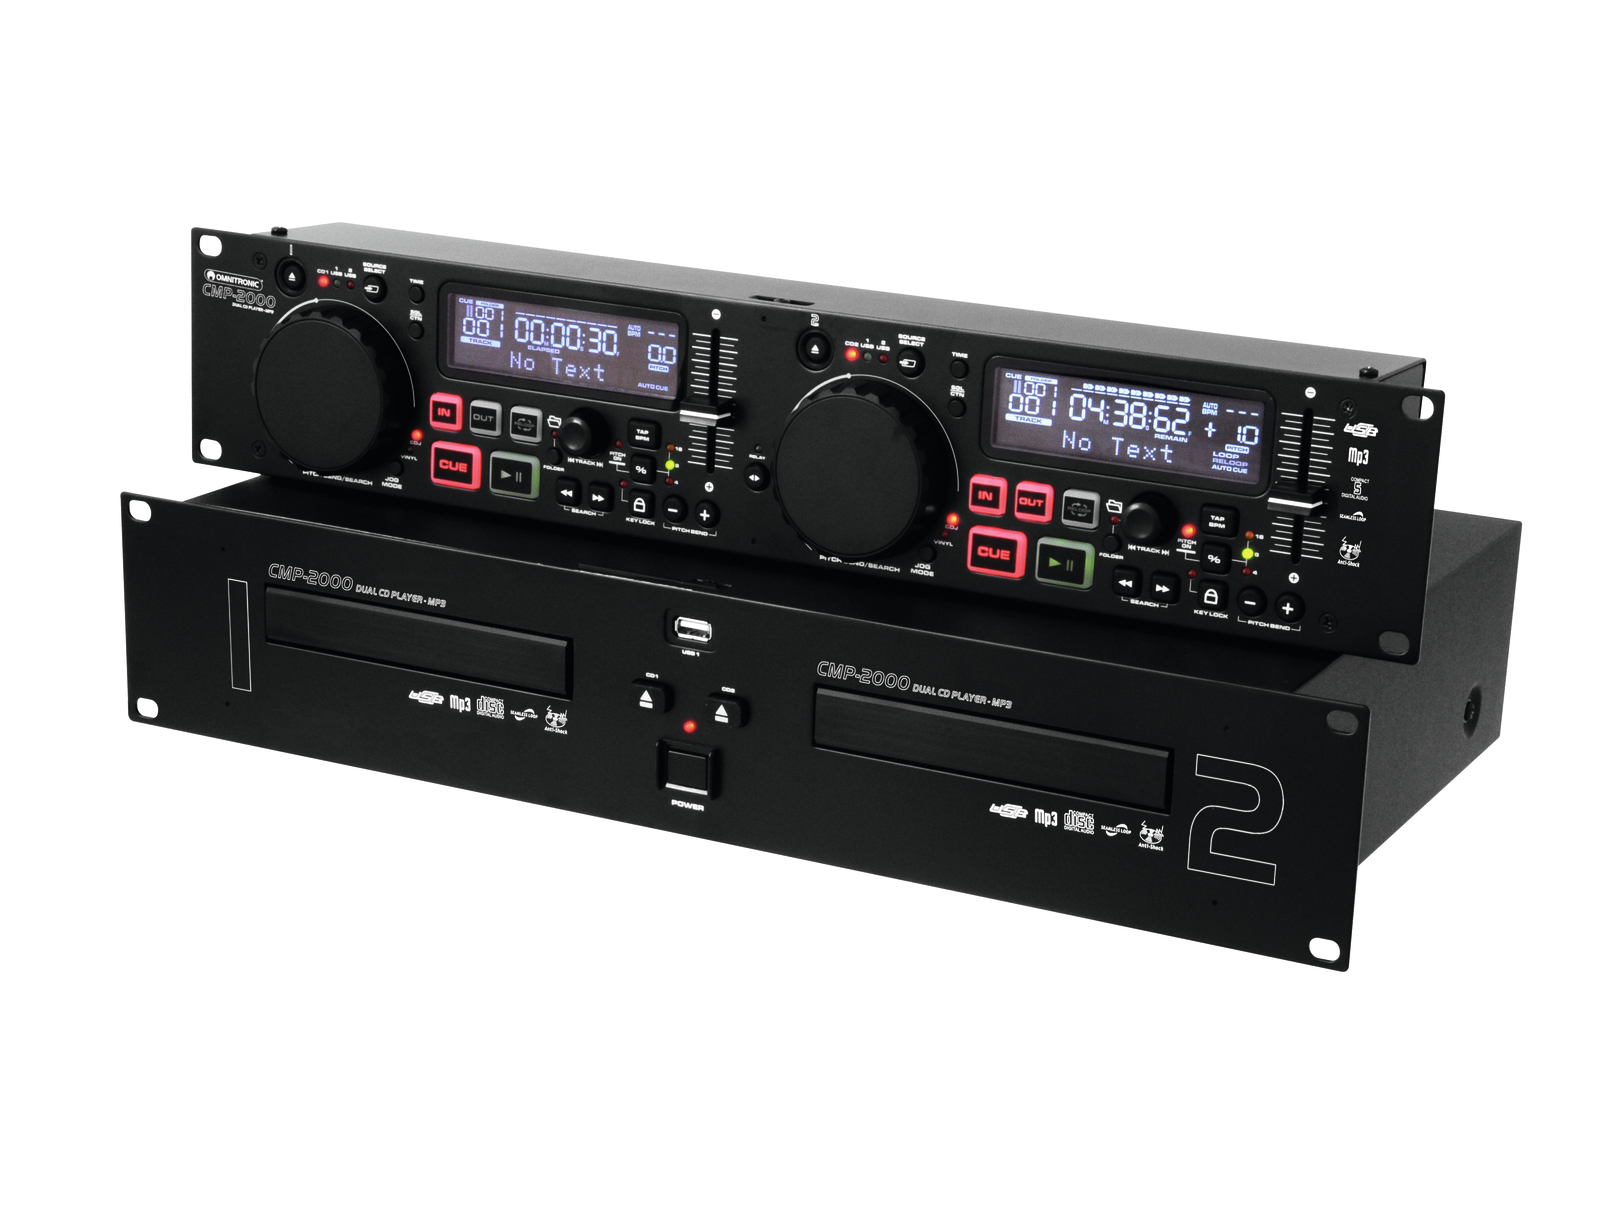 omnitronic-cmp-2000-dual-cd-mp3-player